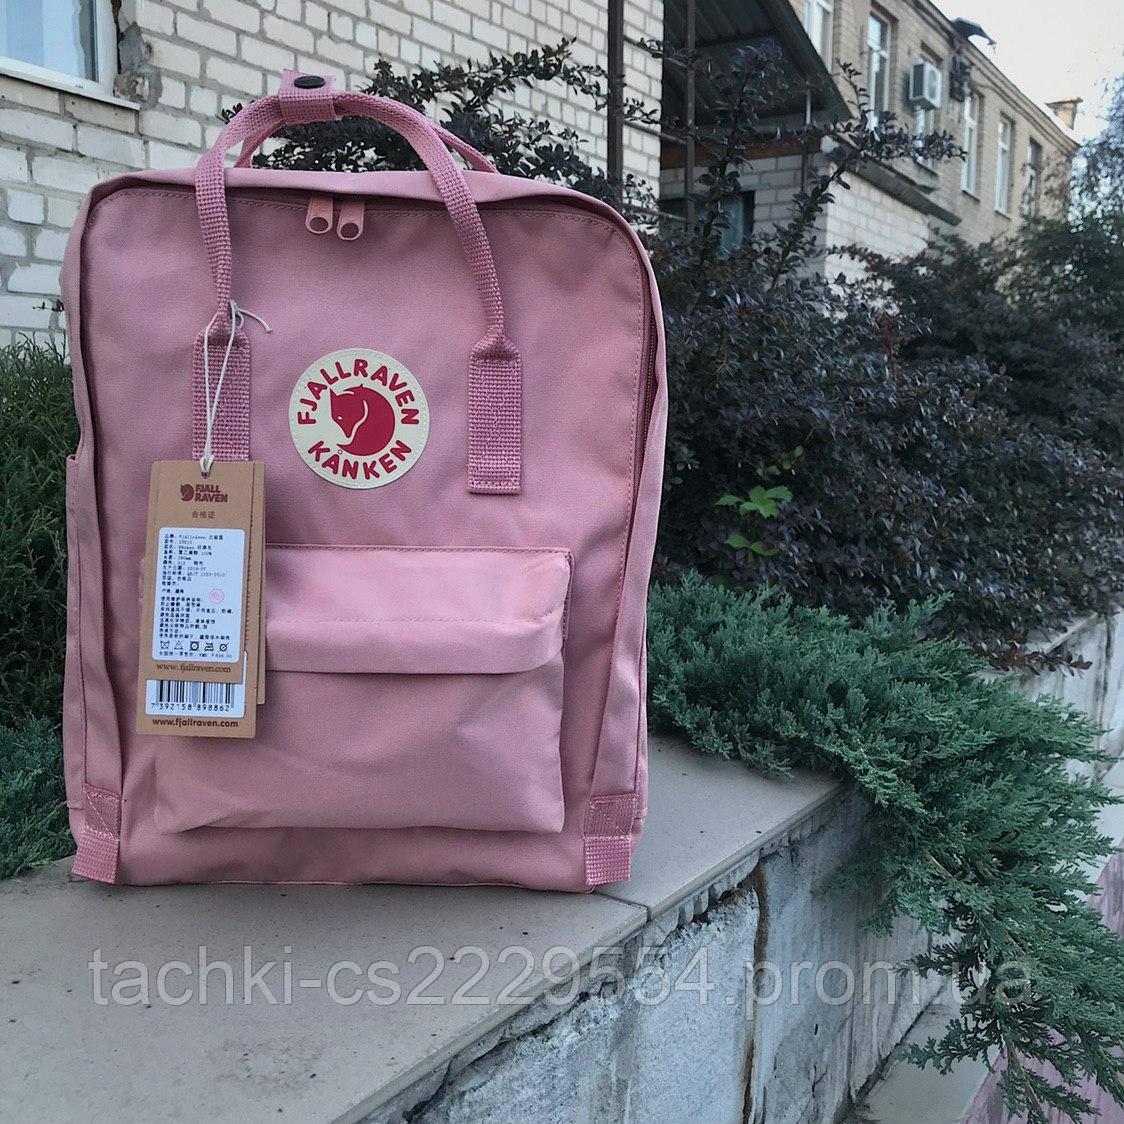 Рюкзак Fjallraven Kanken розовый